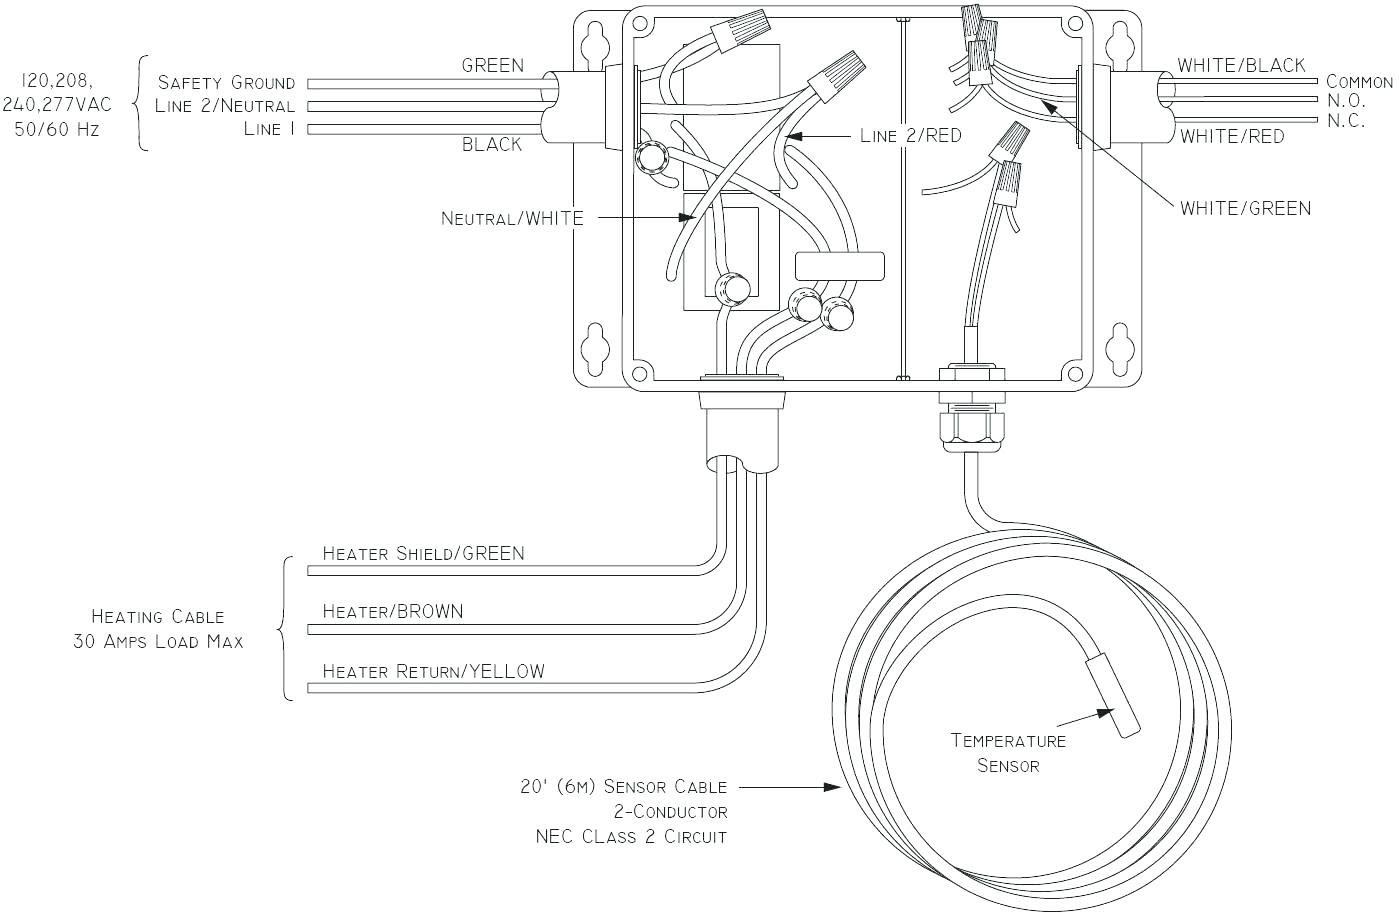 Diagram Water Heater Thermostate Wiring Diagram Full Version Hd Quality Wiring Diagram Diagramsonyaq Camperlot It